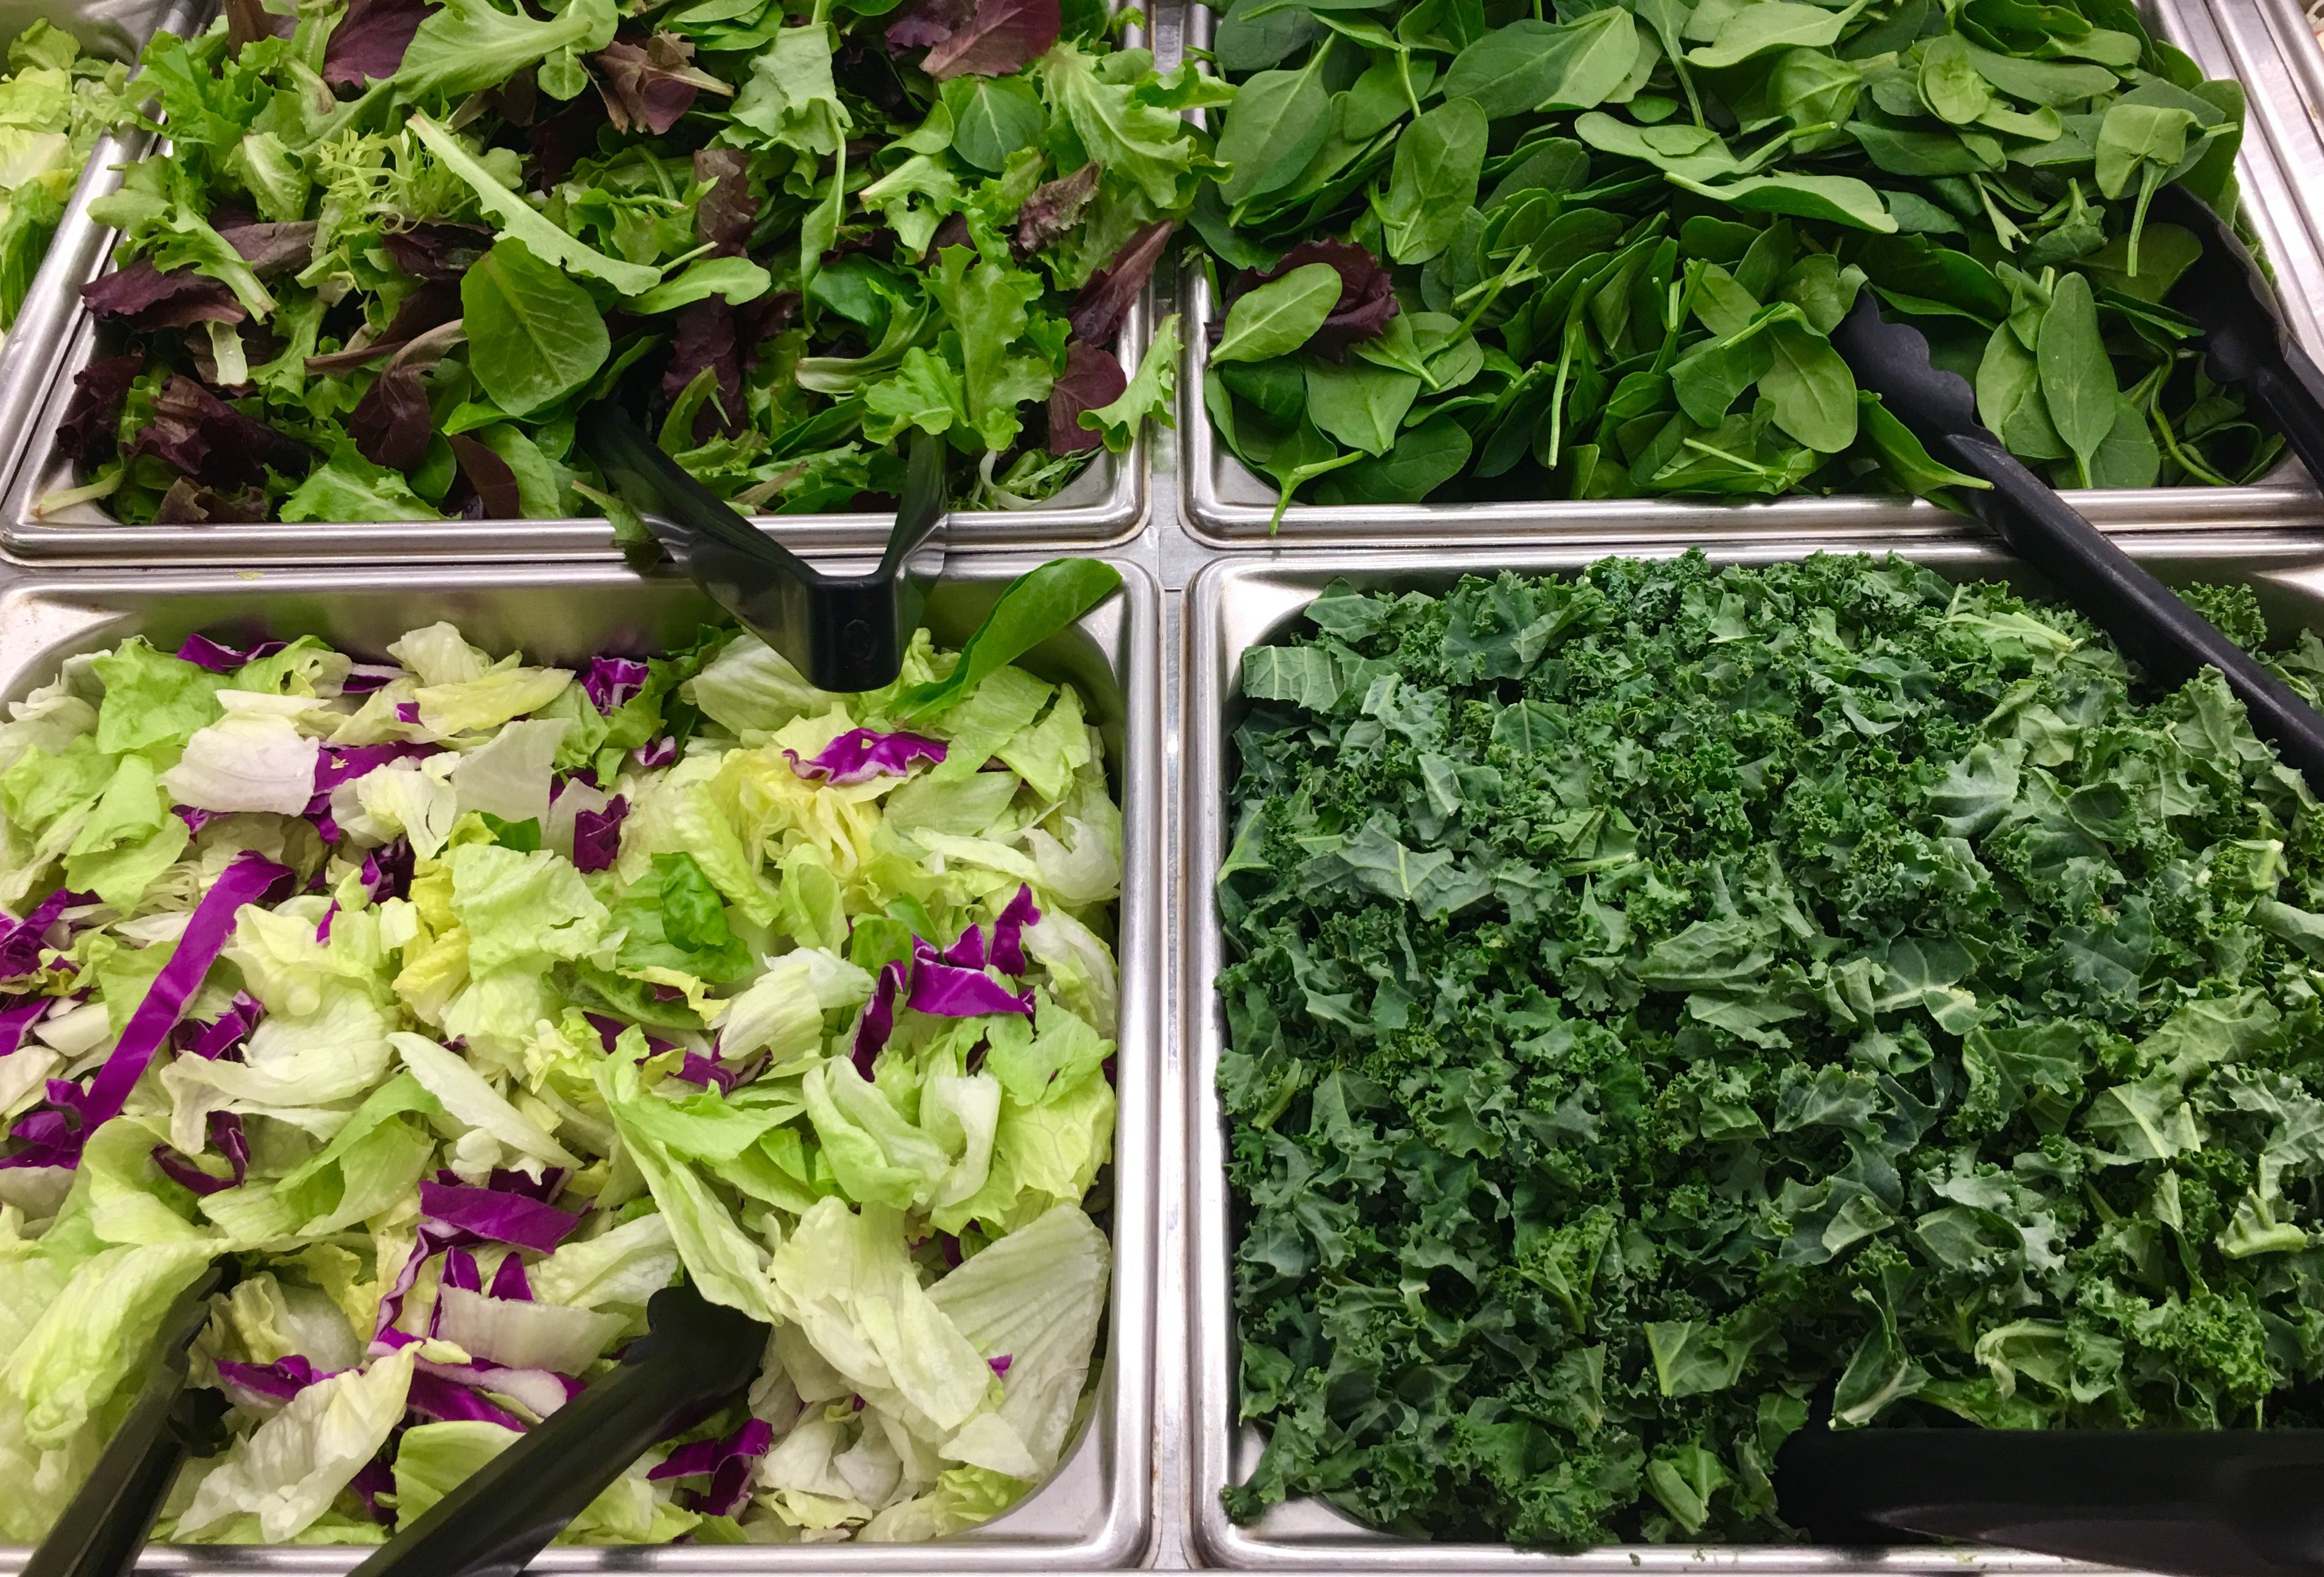 different salad greens in a salad bar